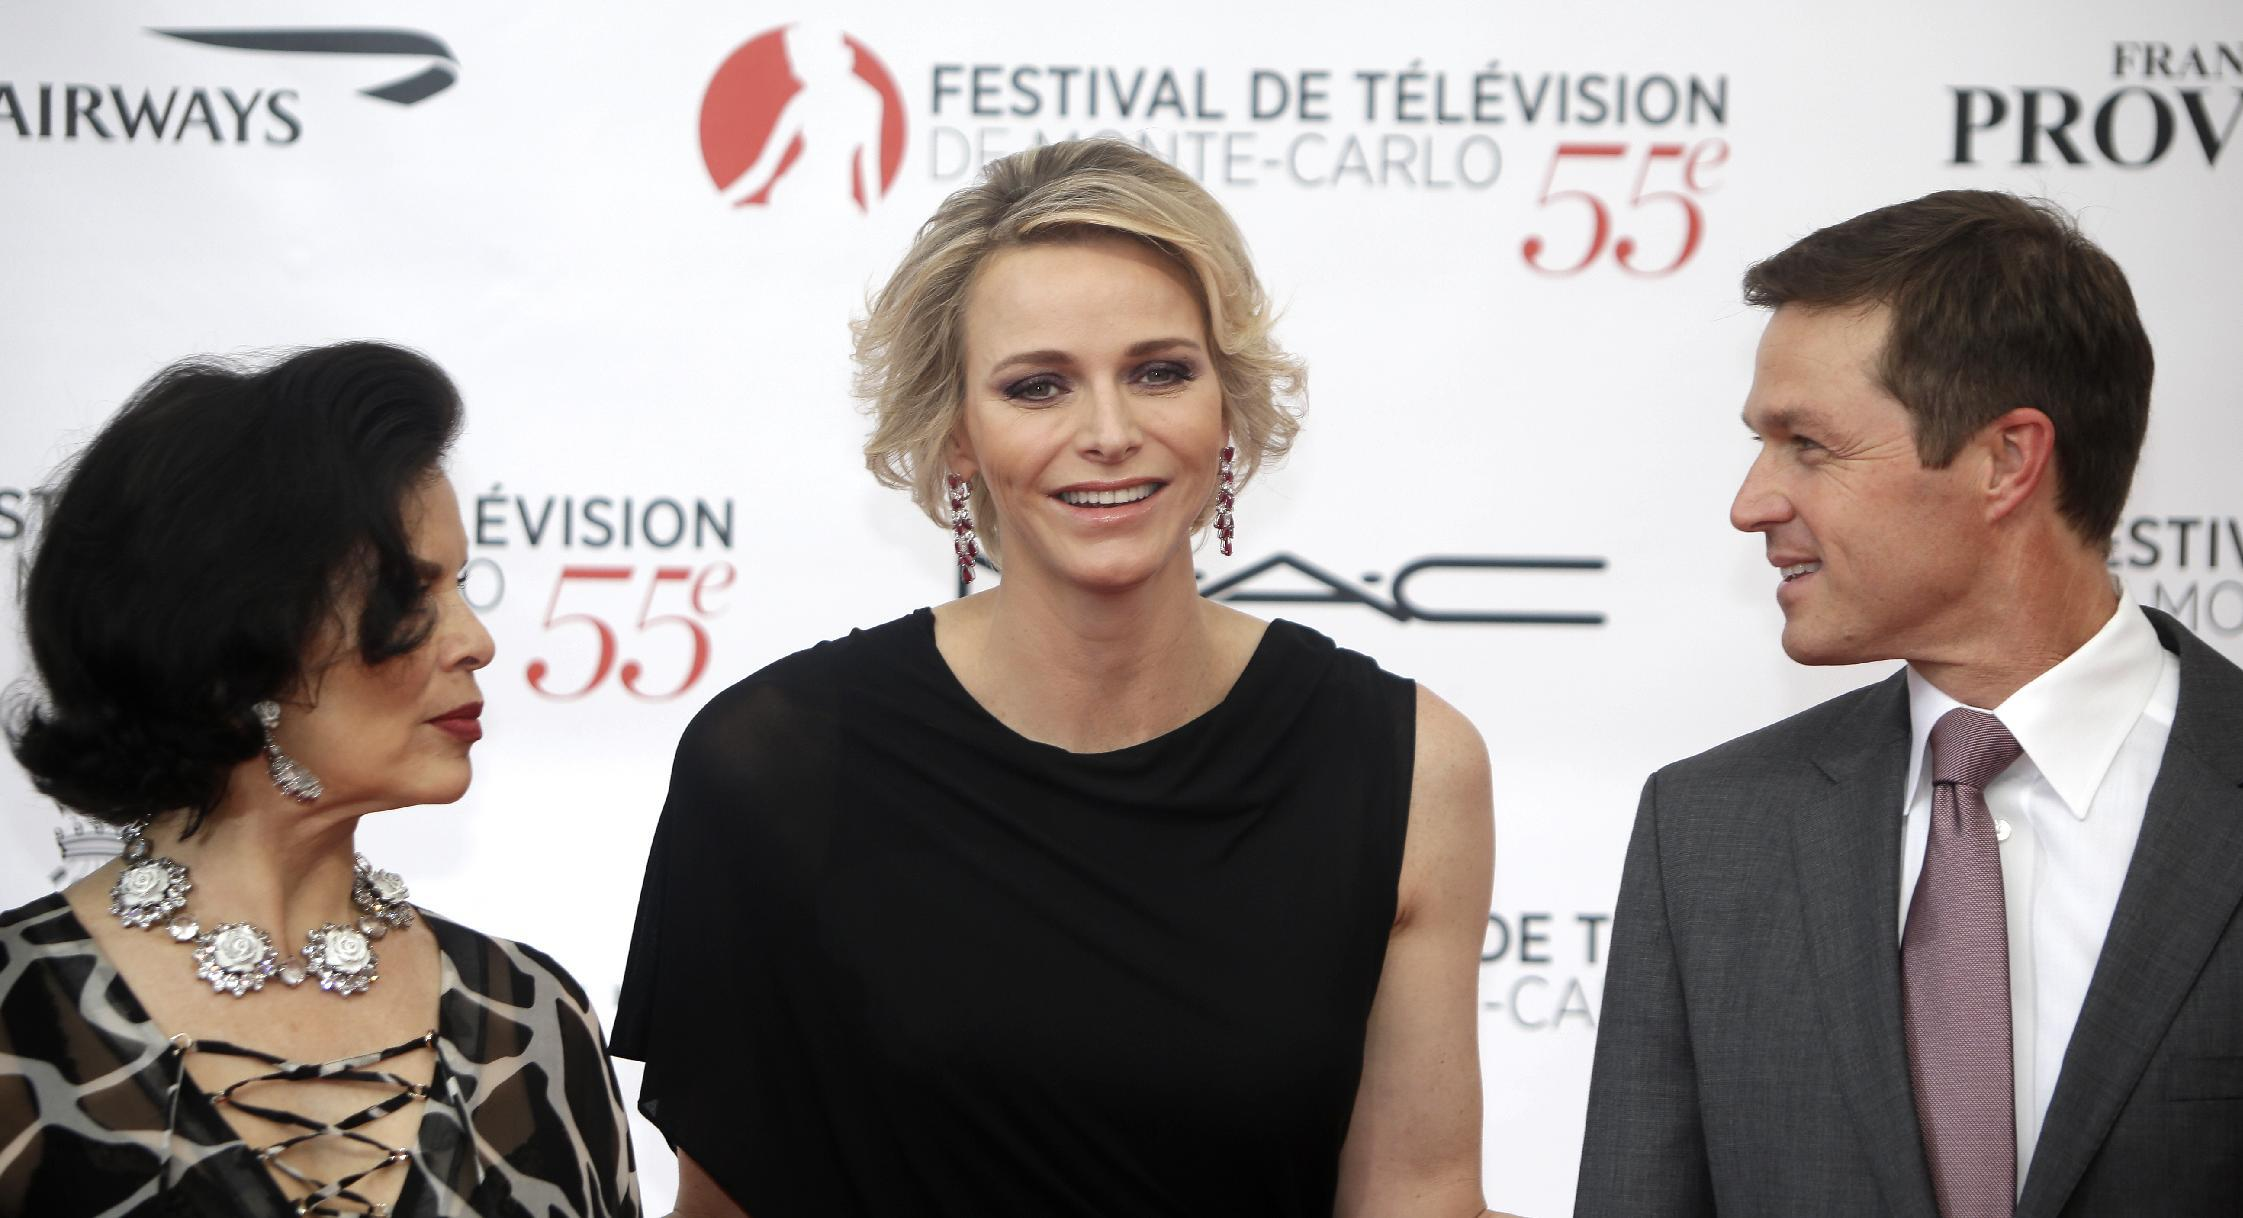 Alberto II y Charlene, Príncipes de Mónaco - Página 10 Ff376f216870491a790f6a706700106b